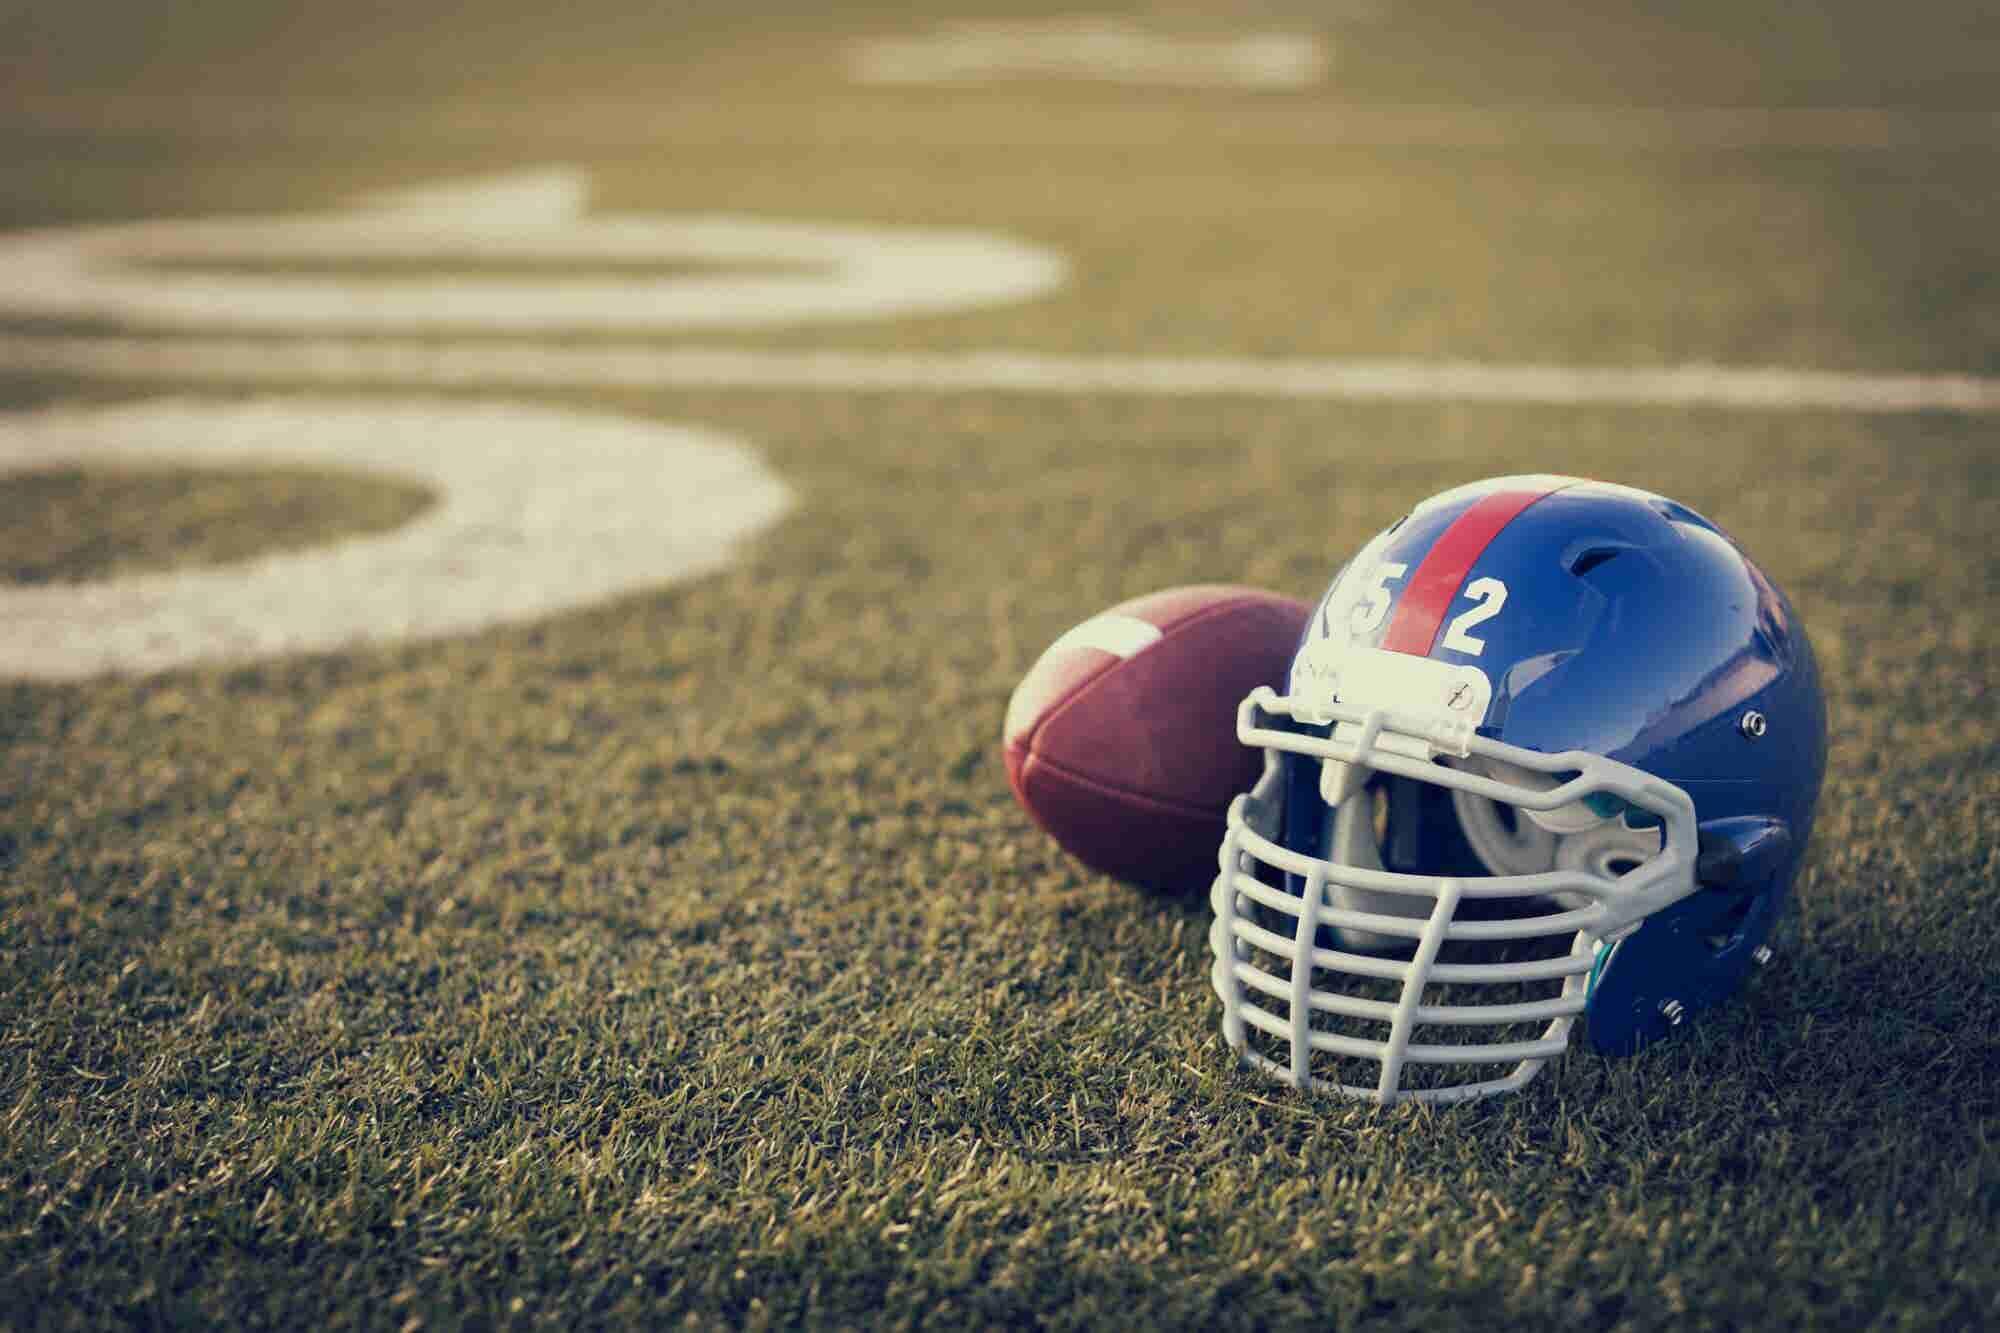 NFL Considers Options for Medical Use of Marijuana